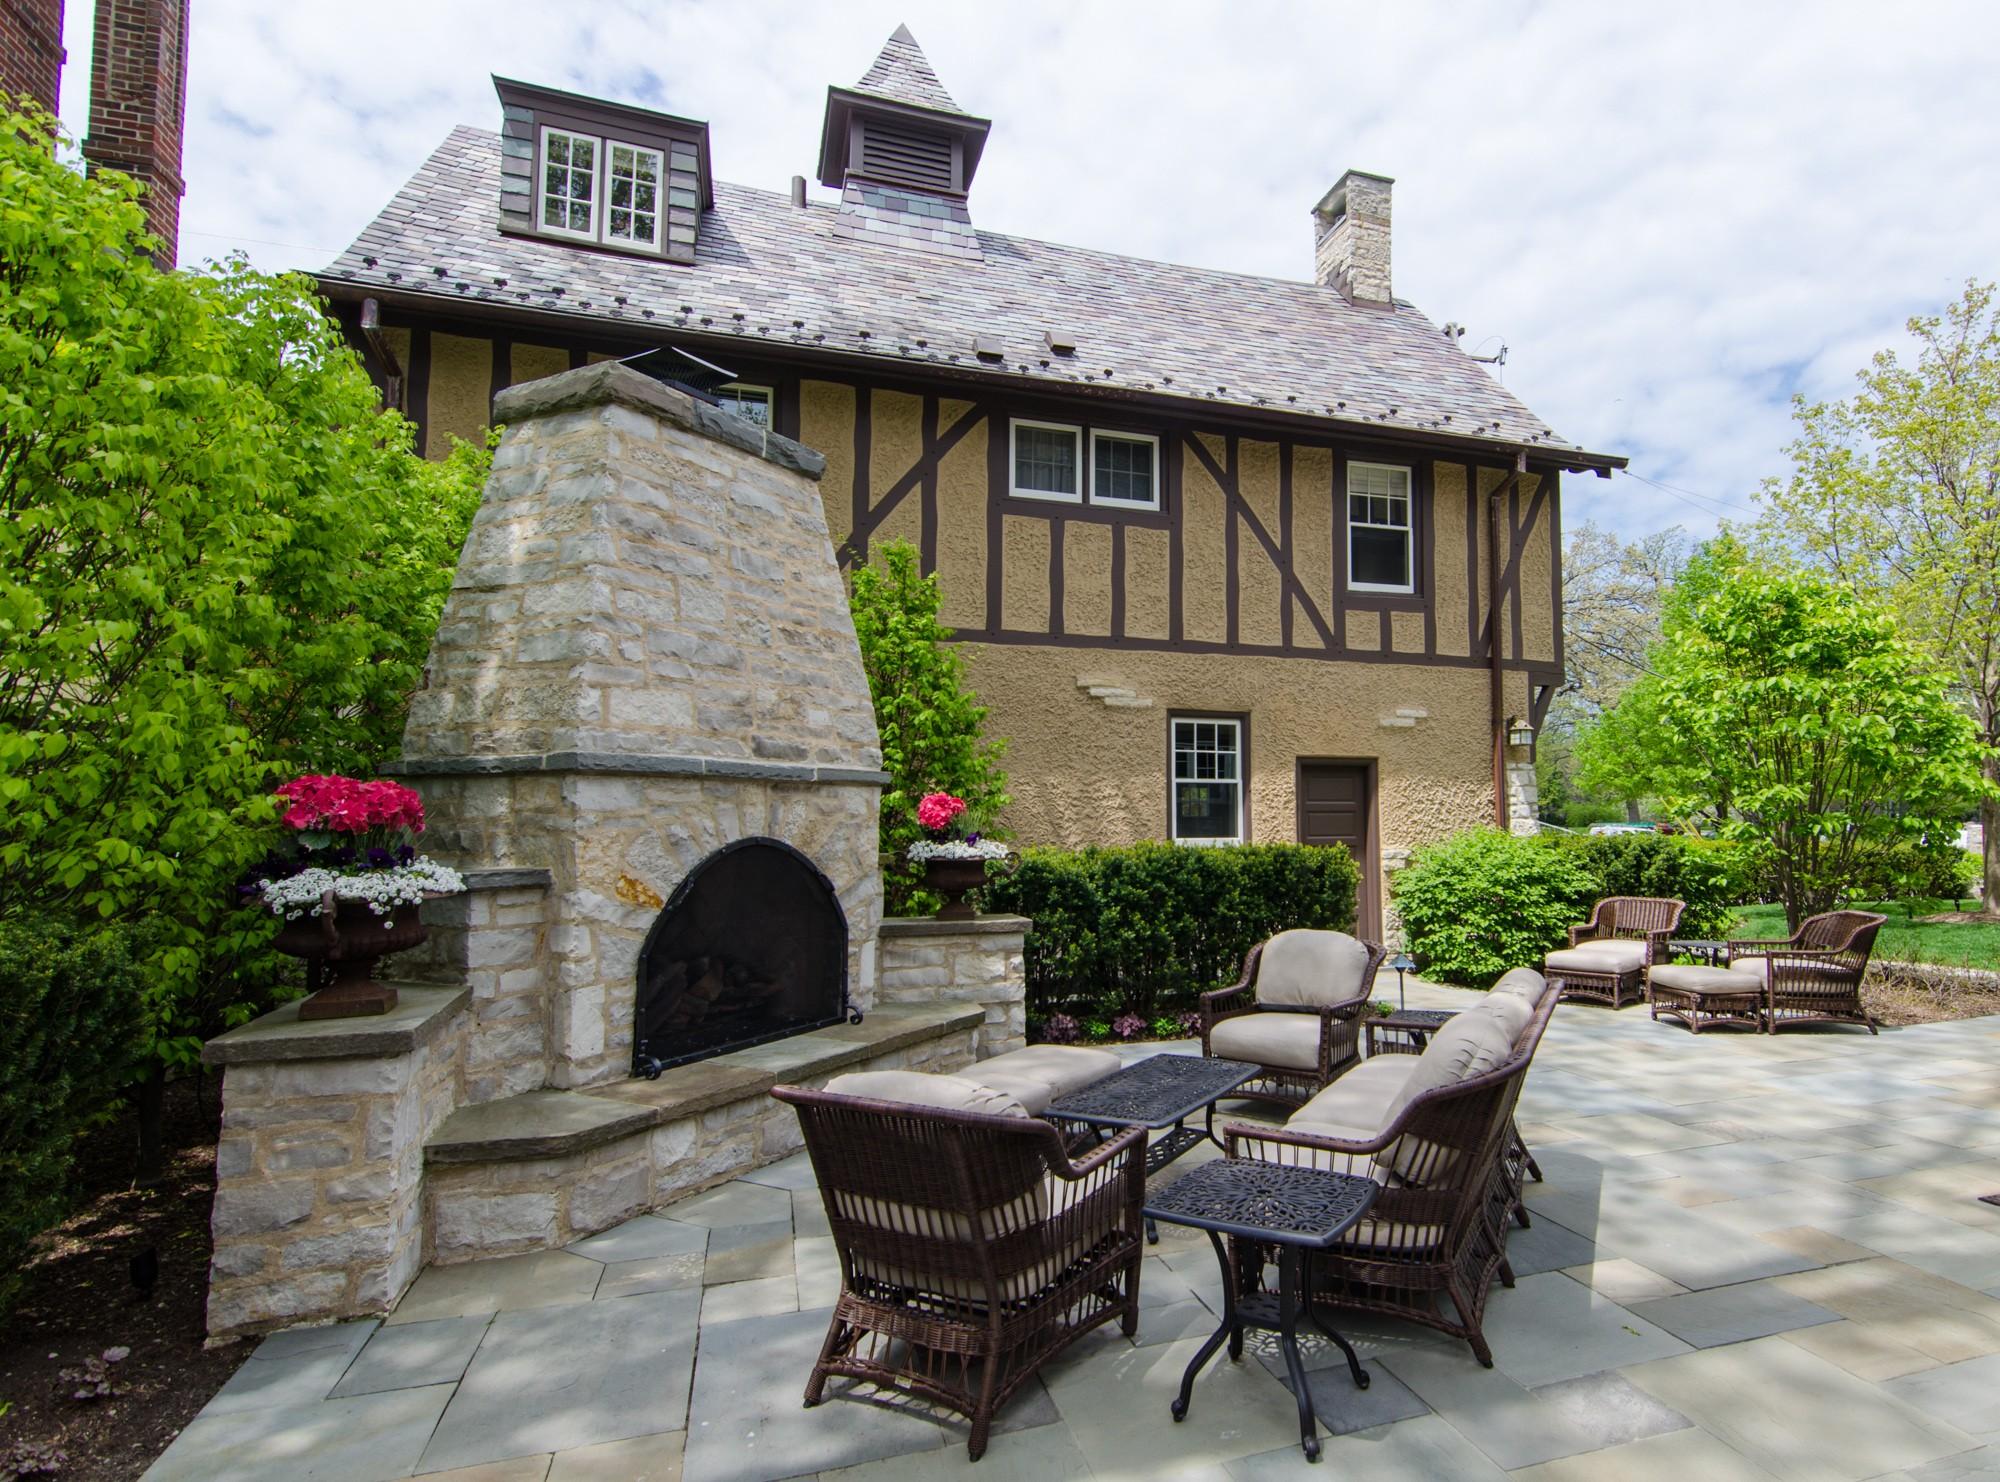 stone-porch-eric-allix-rogers-17.jpg